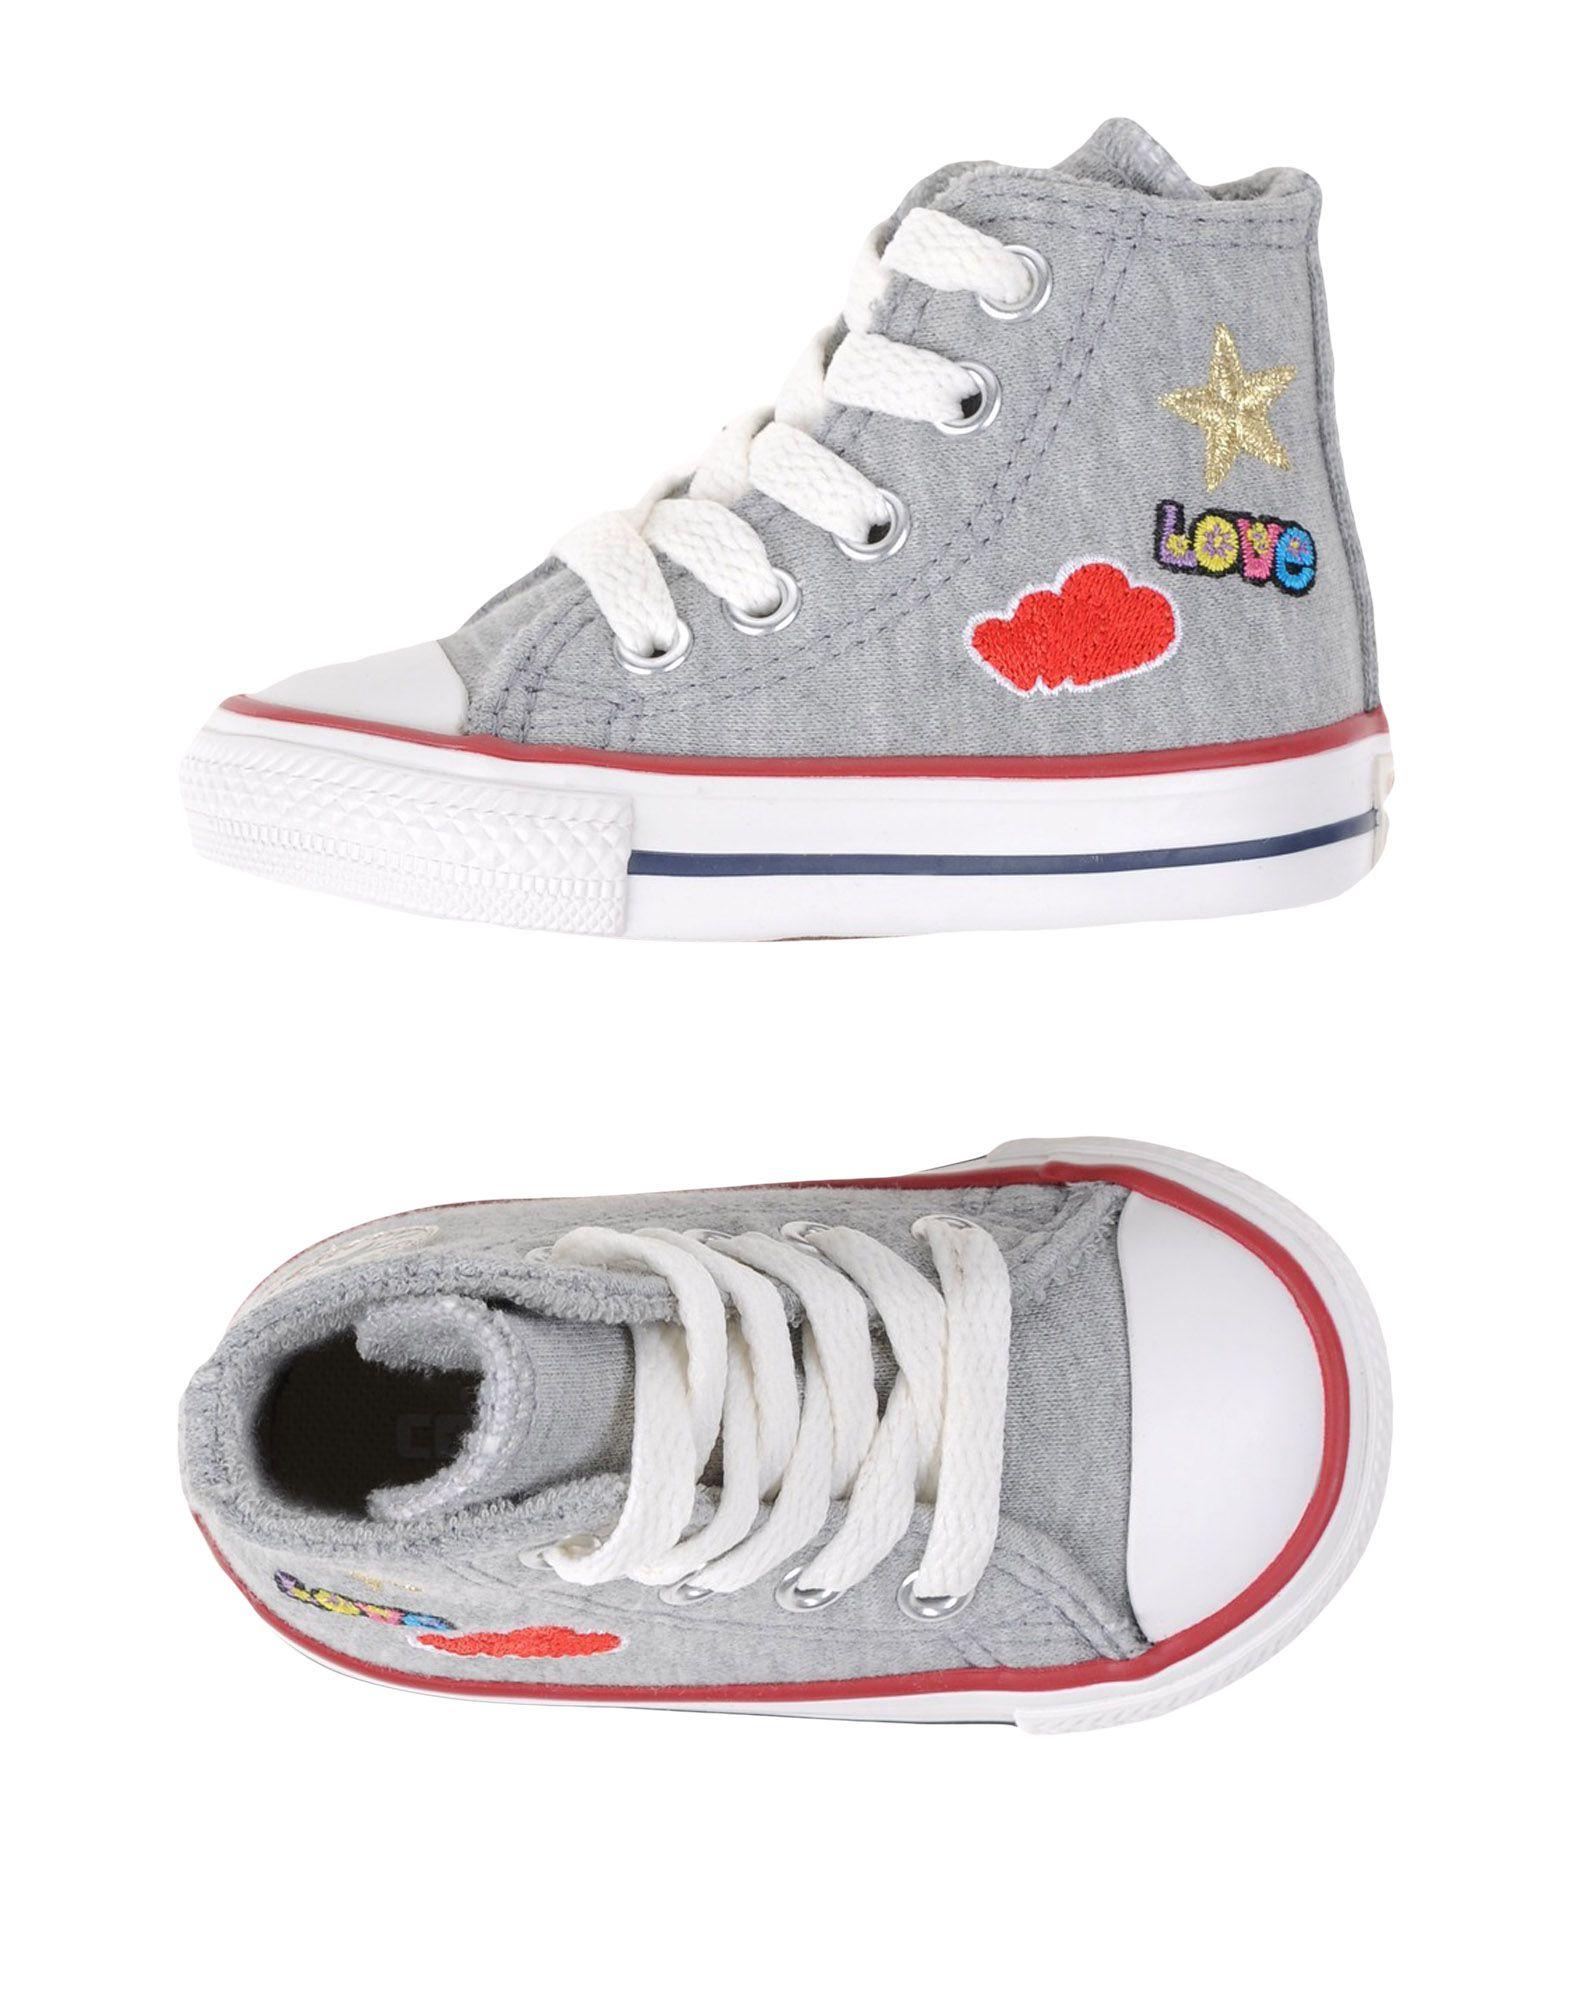 CONVERSE ALL STAR Mädchen 0-24 monate Low Sneakers & Tennisschuhe Farbe Grau Größe 9